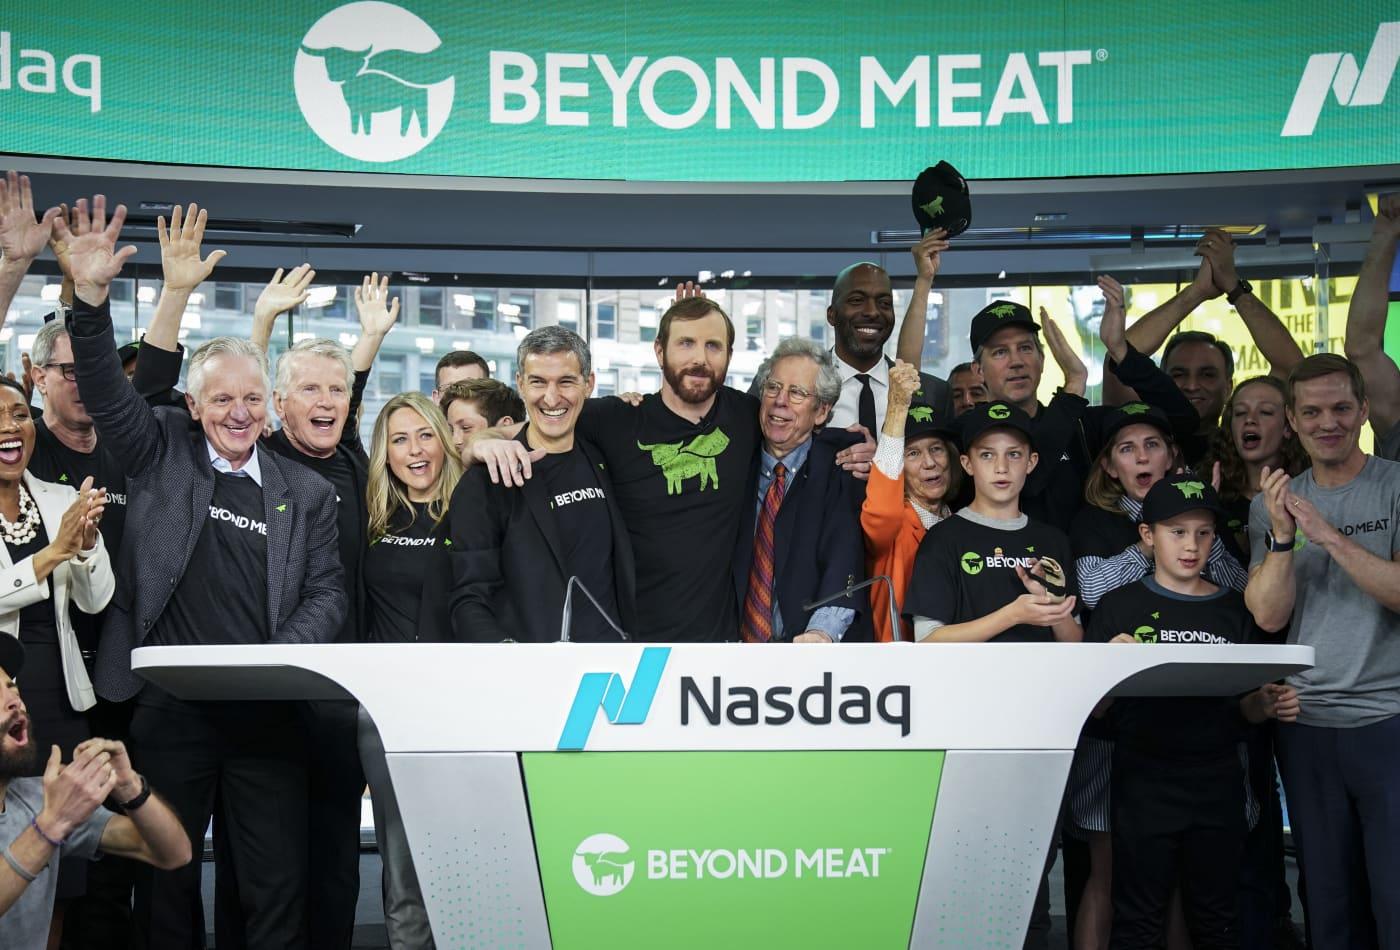 Beyond meat cnn ipo